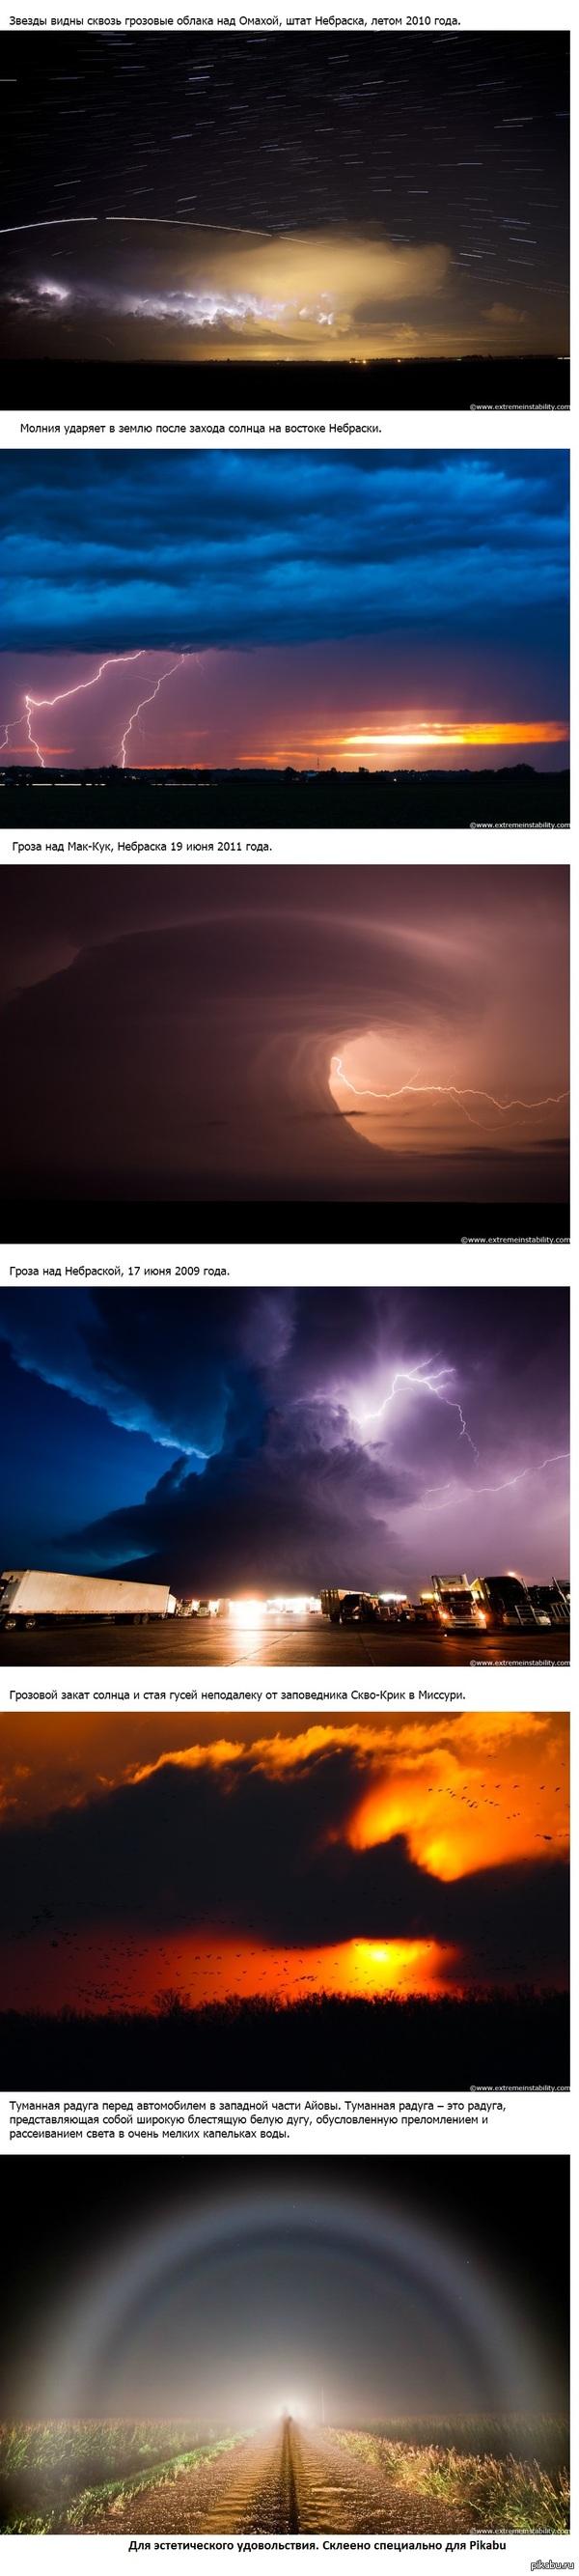 Грозовое небо Фотограф Майк Холлингсхед